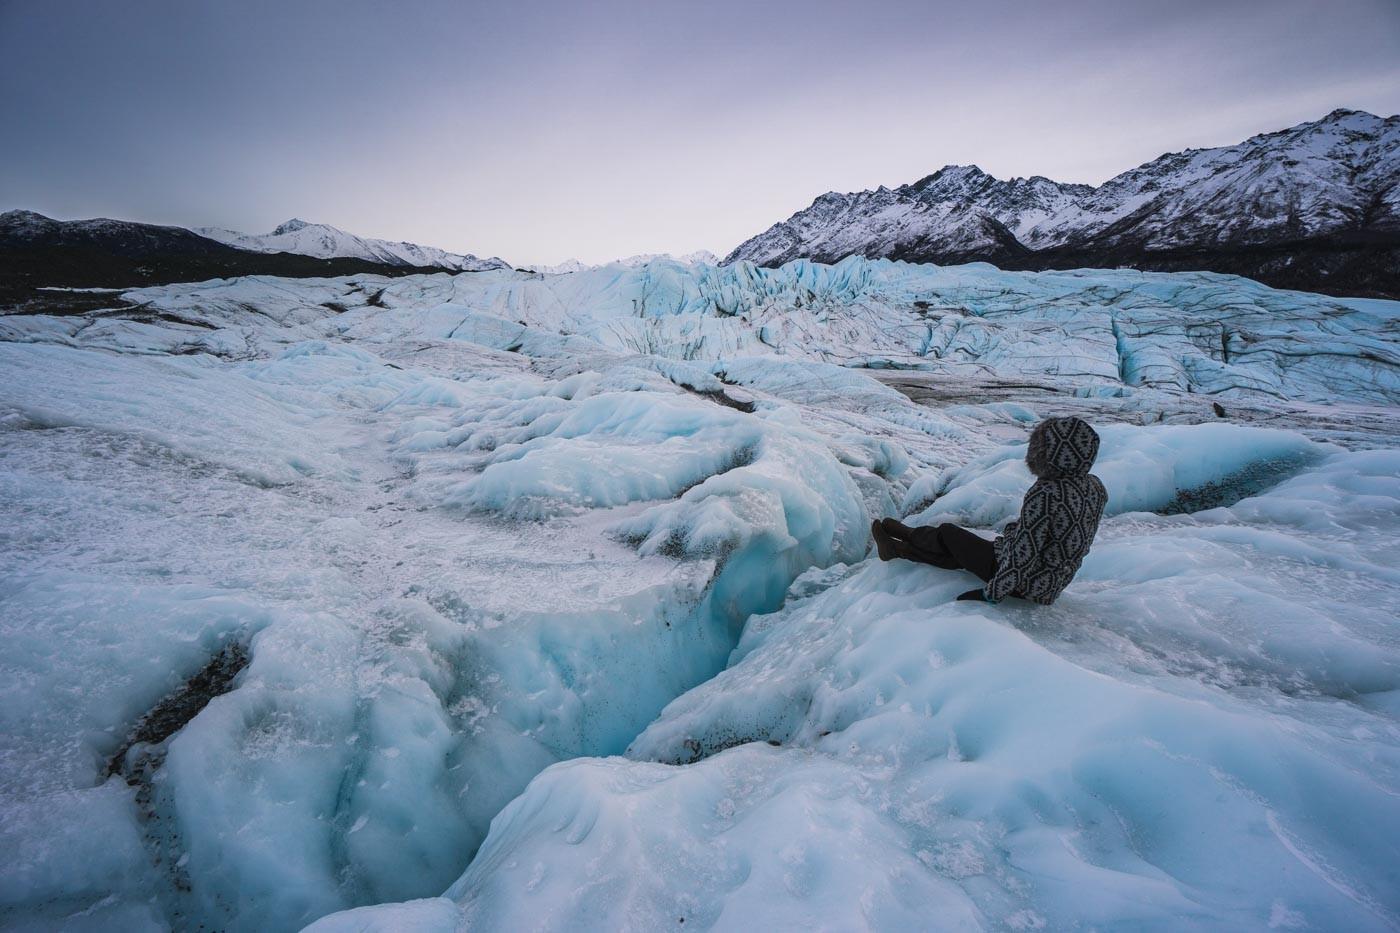 sony-e-10-18mm-f4-oss-lens-alaska-matanuska-glacier-1